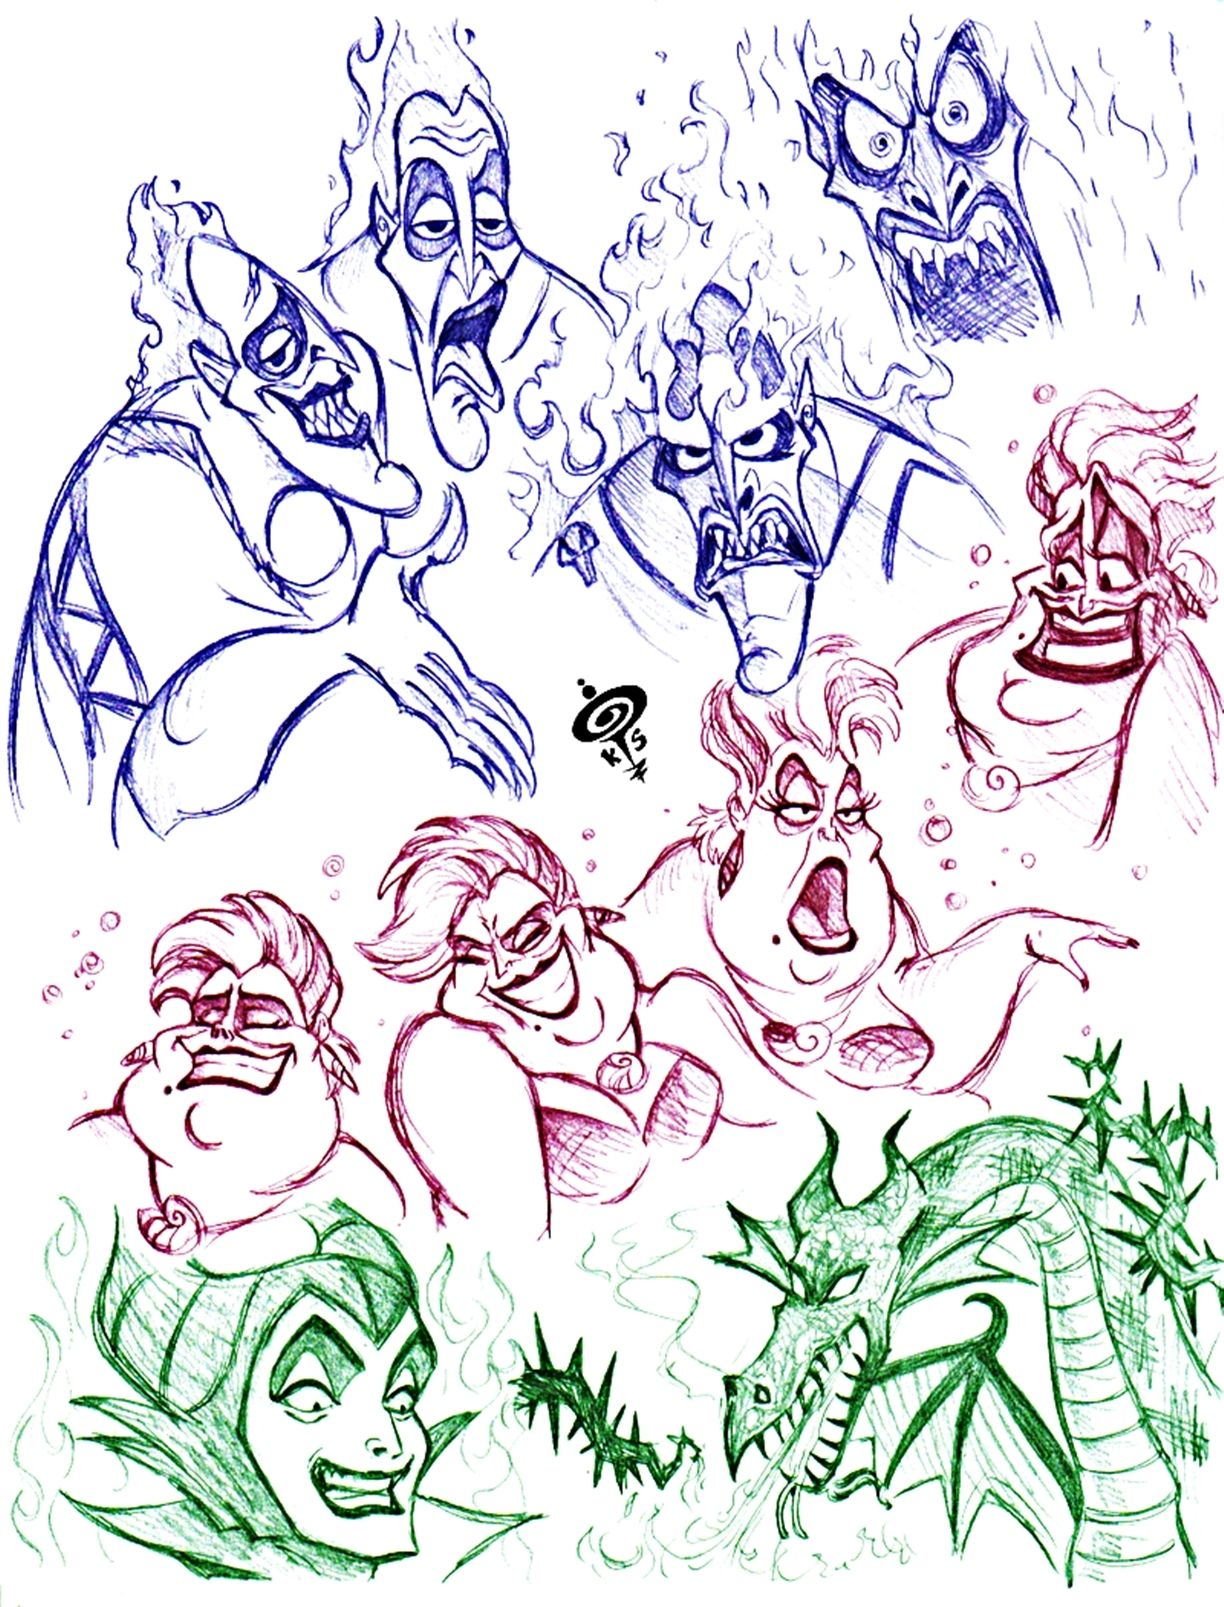 Disney ursula coloring pages - Disney Villains Coloring Pages Walt Disney Fan Art Disney Villains Sketch Walt Disney